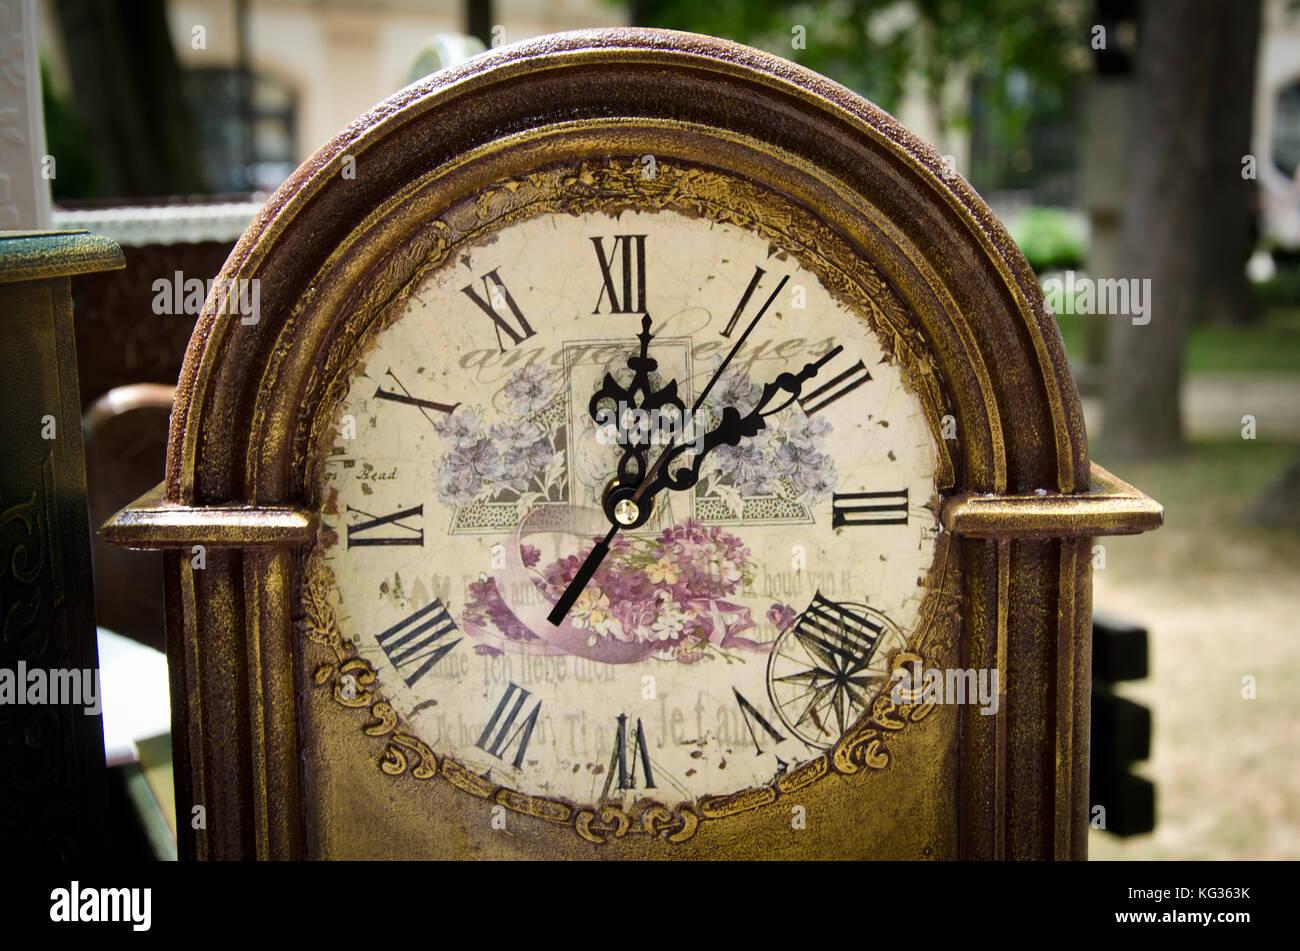 ornamented antique clock close up - Stock Image